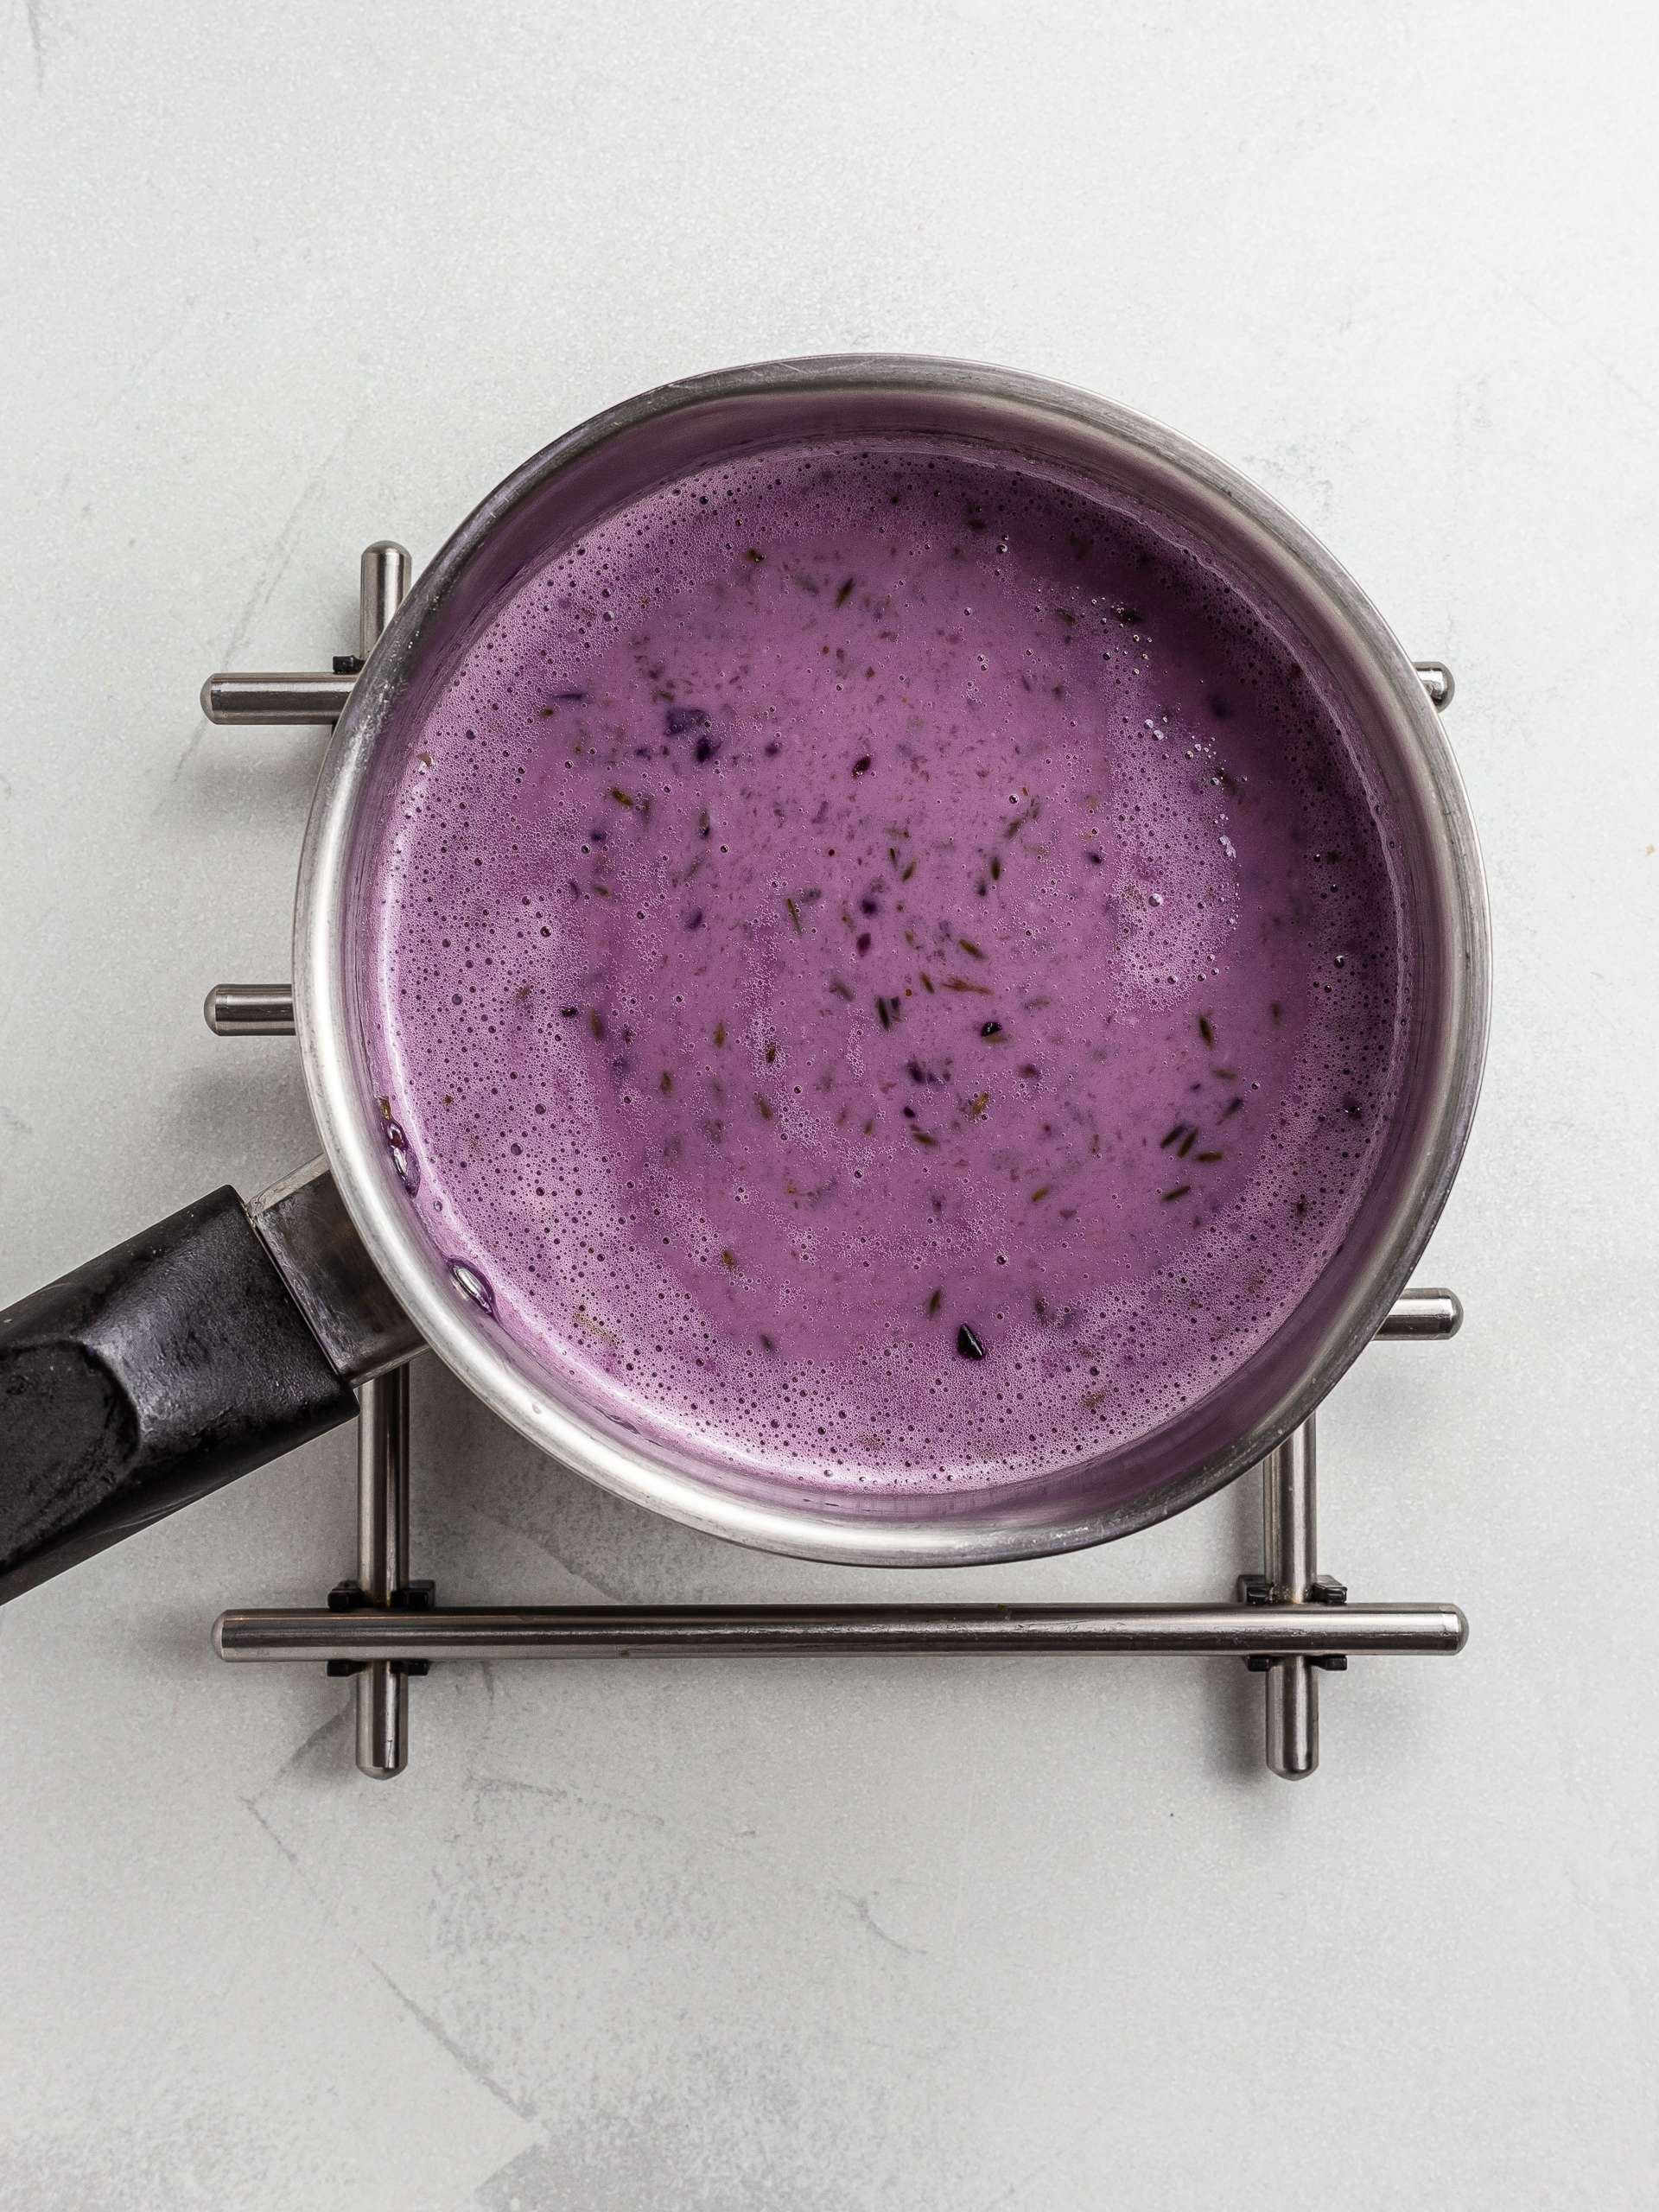 lavender ice cream base in a pot